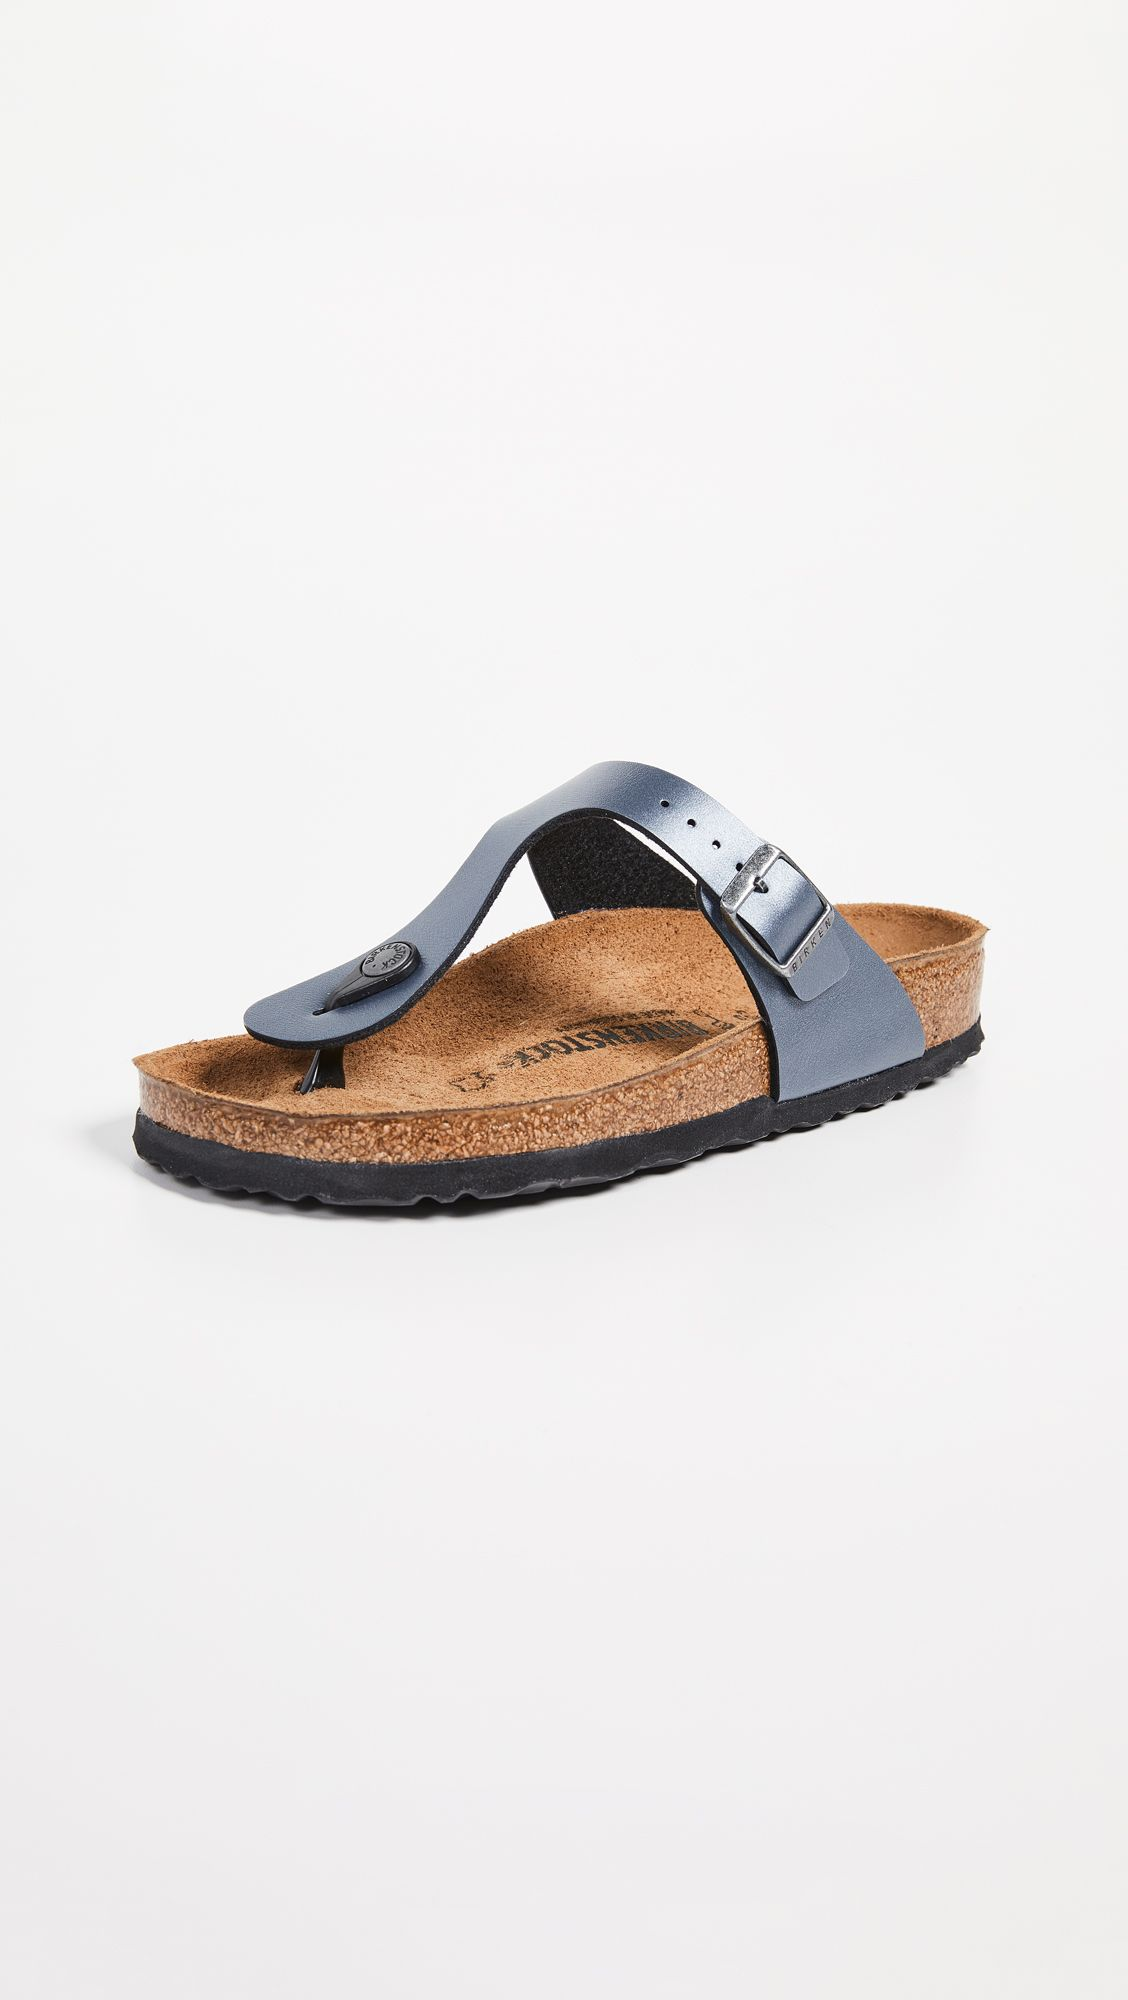 Birkenstock Gizeh Sandals   SHOPBOP in